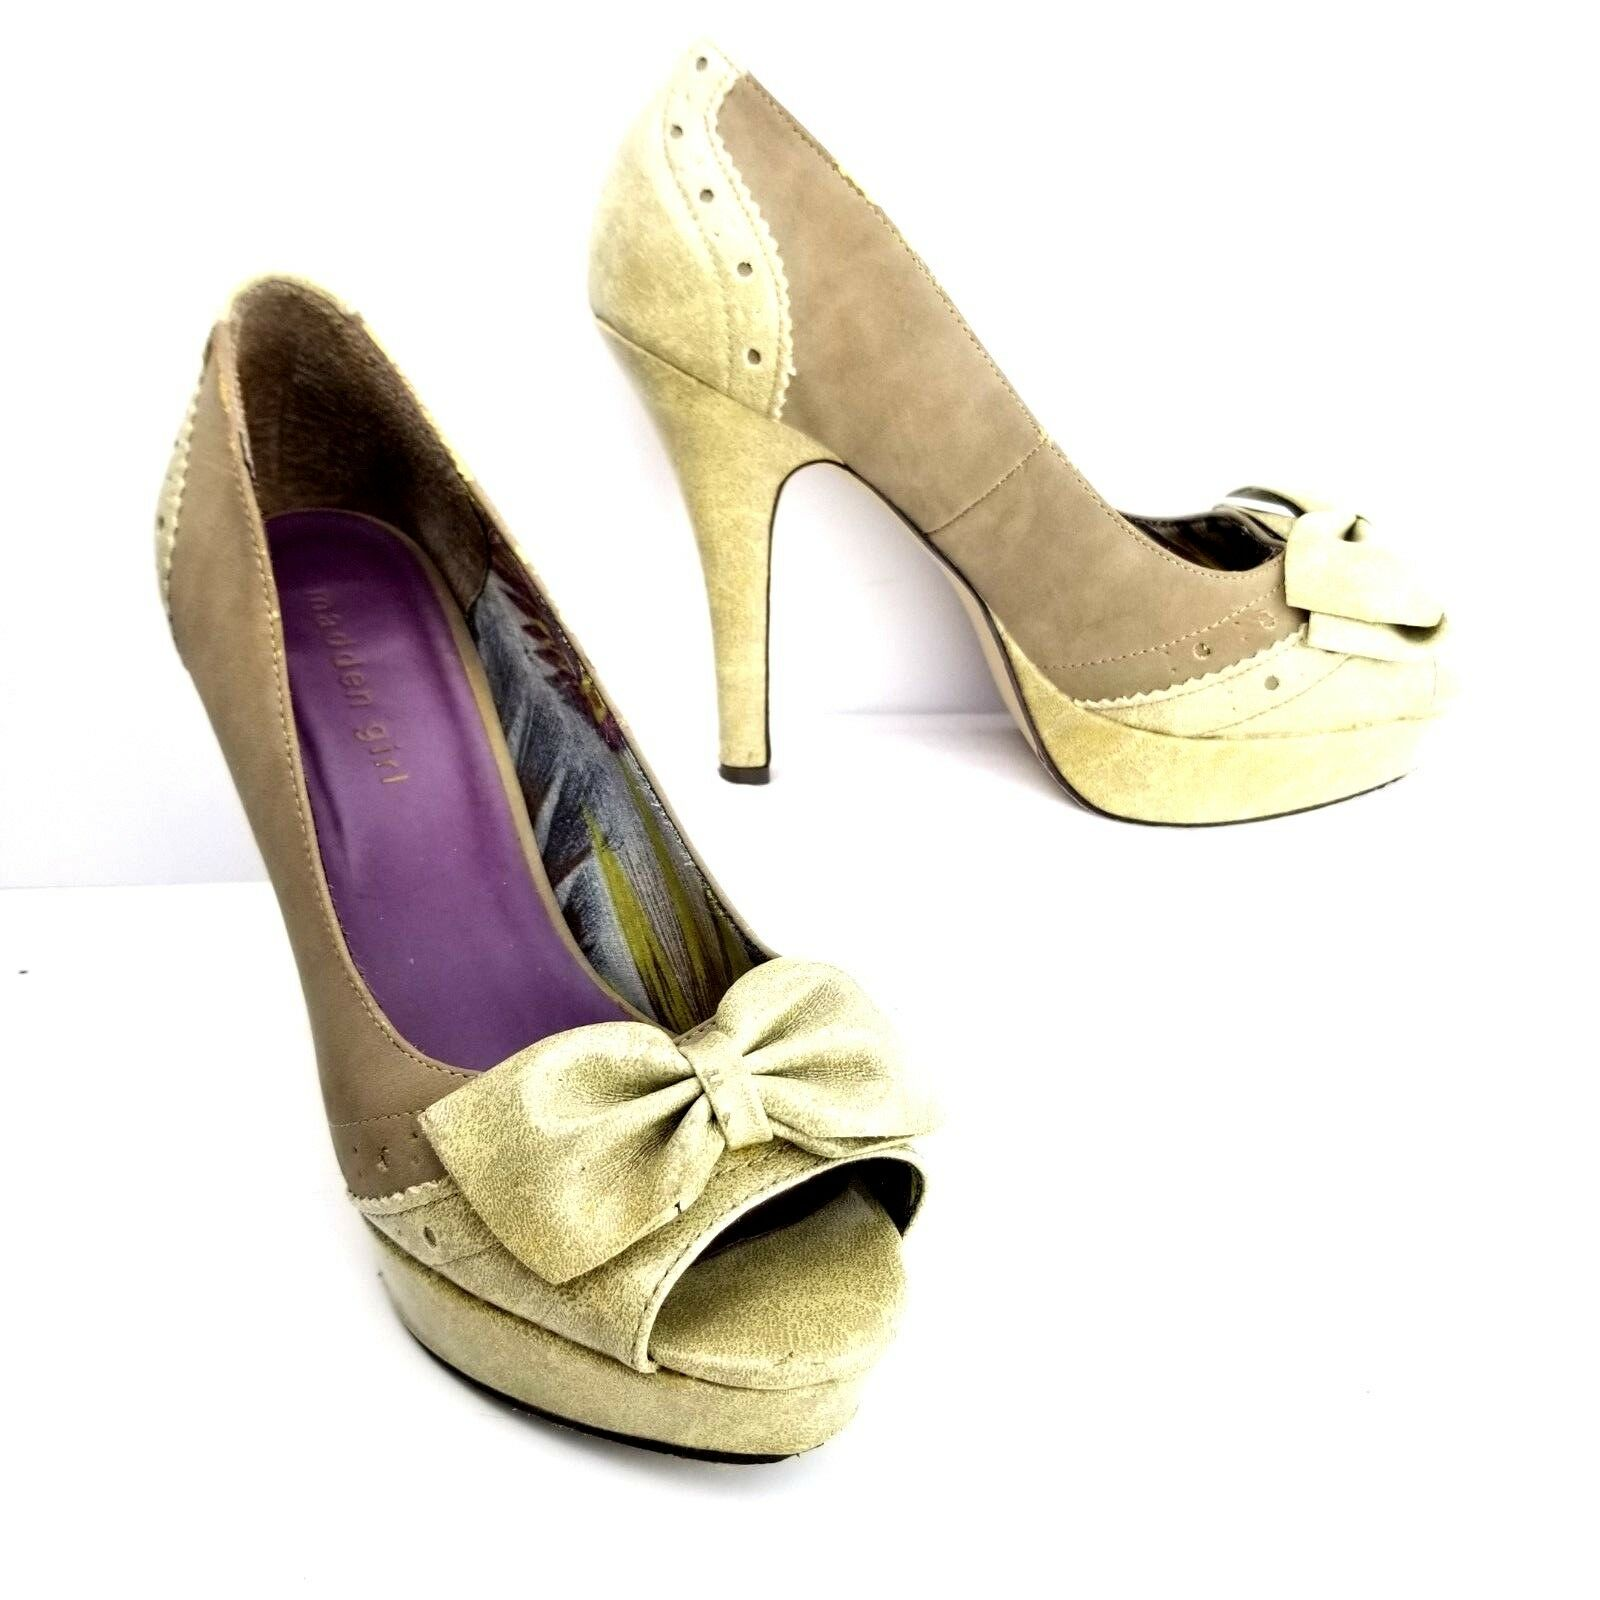 Madden Girl Platform Heels Peep Size 8.5 Gray Bow Peep Heels Toe Shoe Heels Womens Speckled 70dd7e